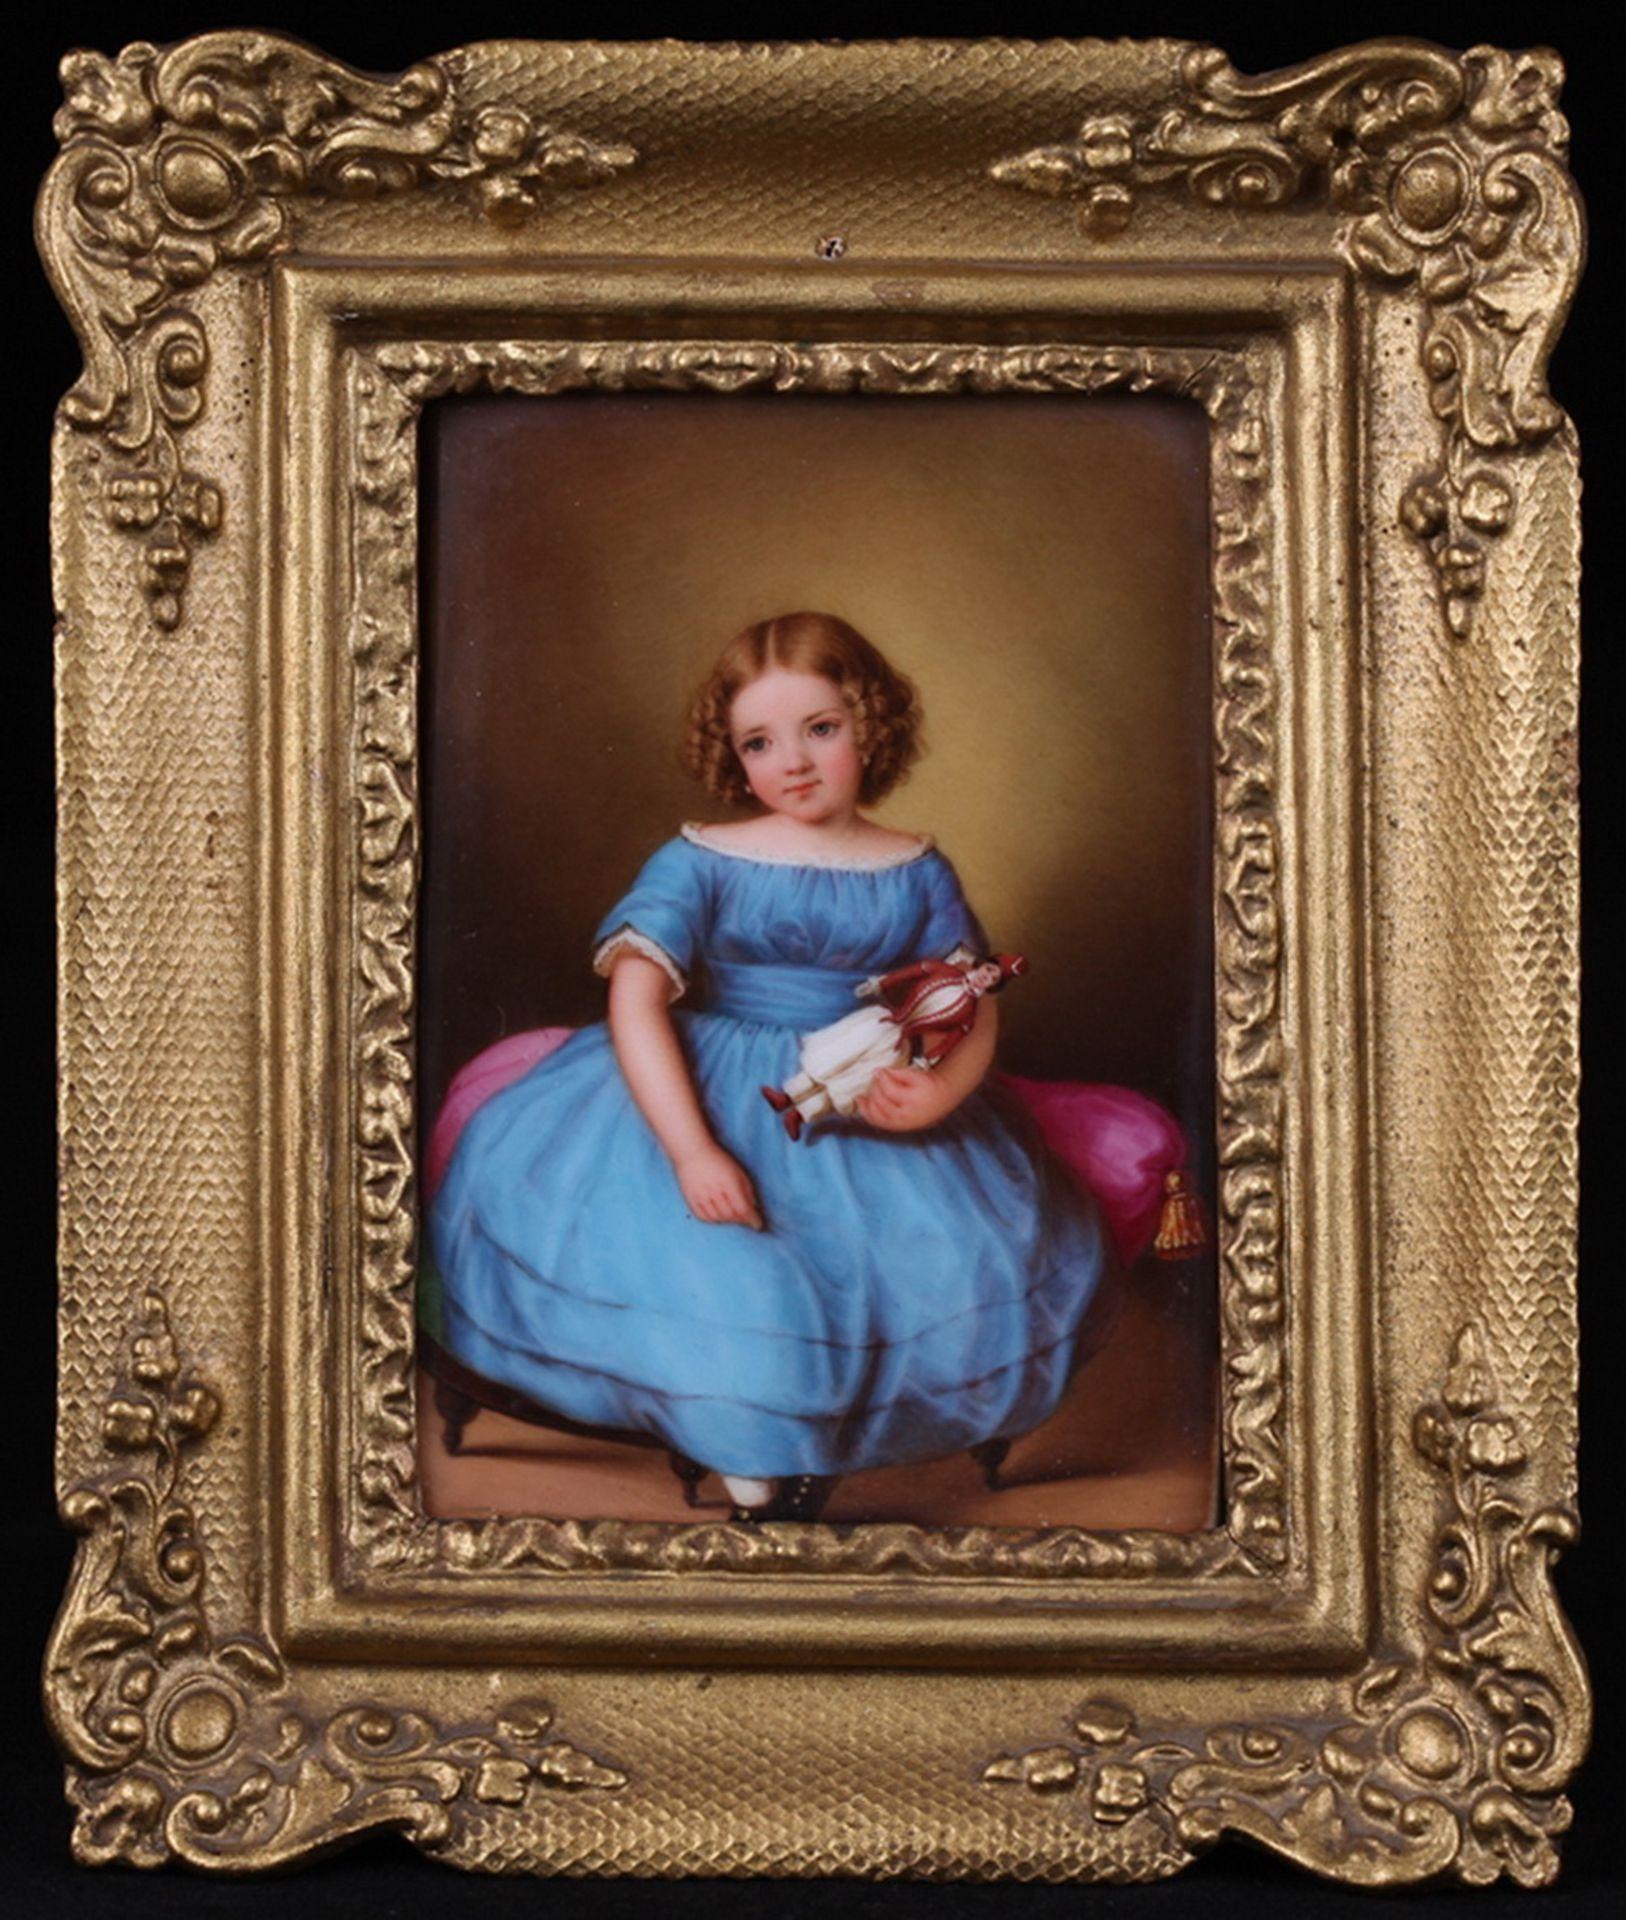 Hoffmann, E. Girl with a doll. Porcelain painting. 1853. 10,7x7,5 cm.<br>Framed. Artist's sign and d - Bild 3 aus 4